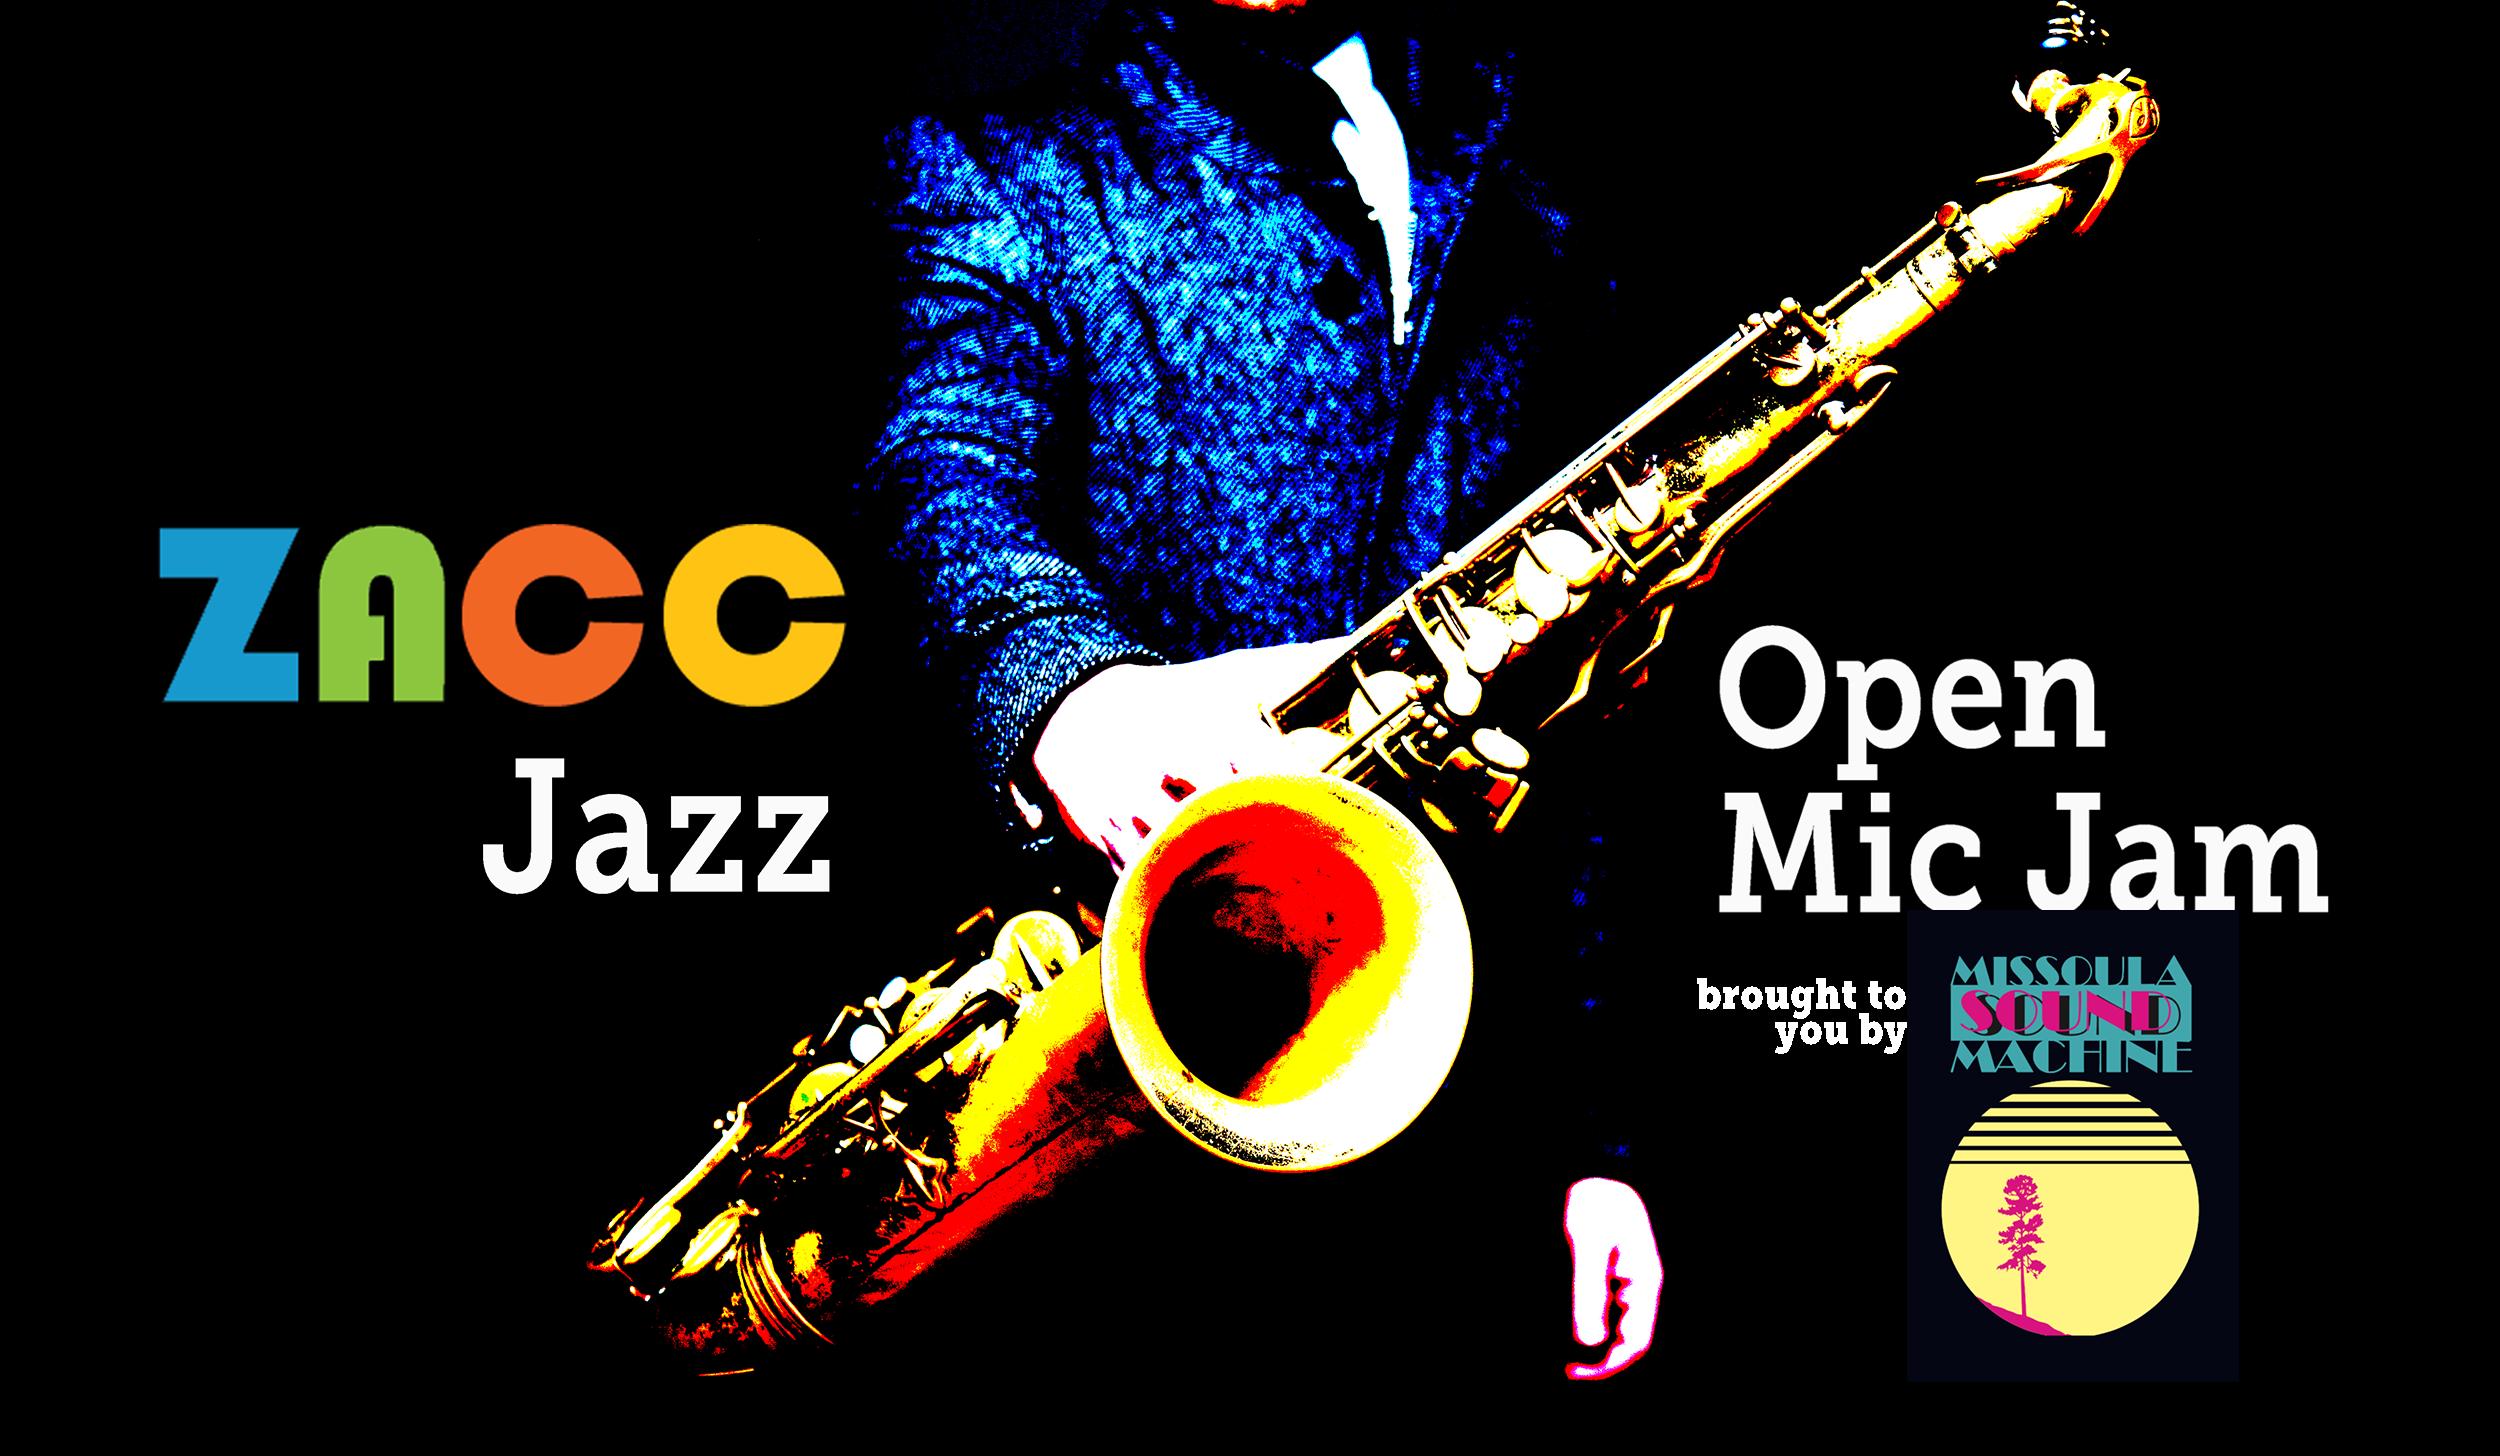 ZACC Jazz Open Mic Jam